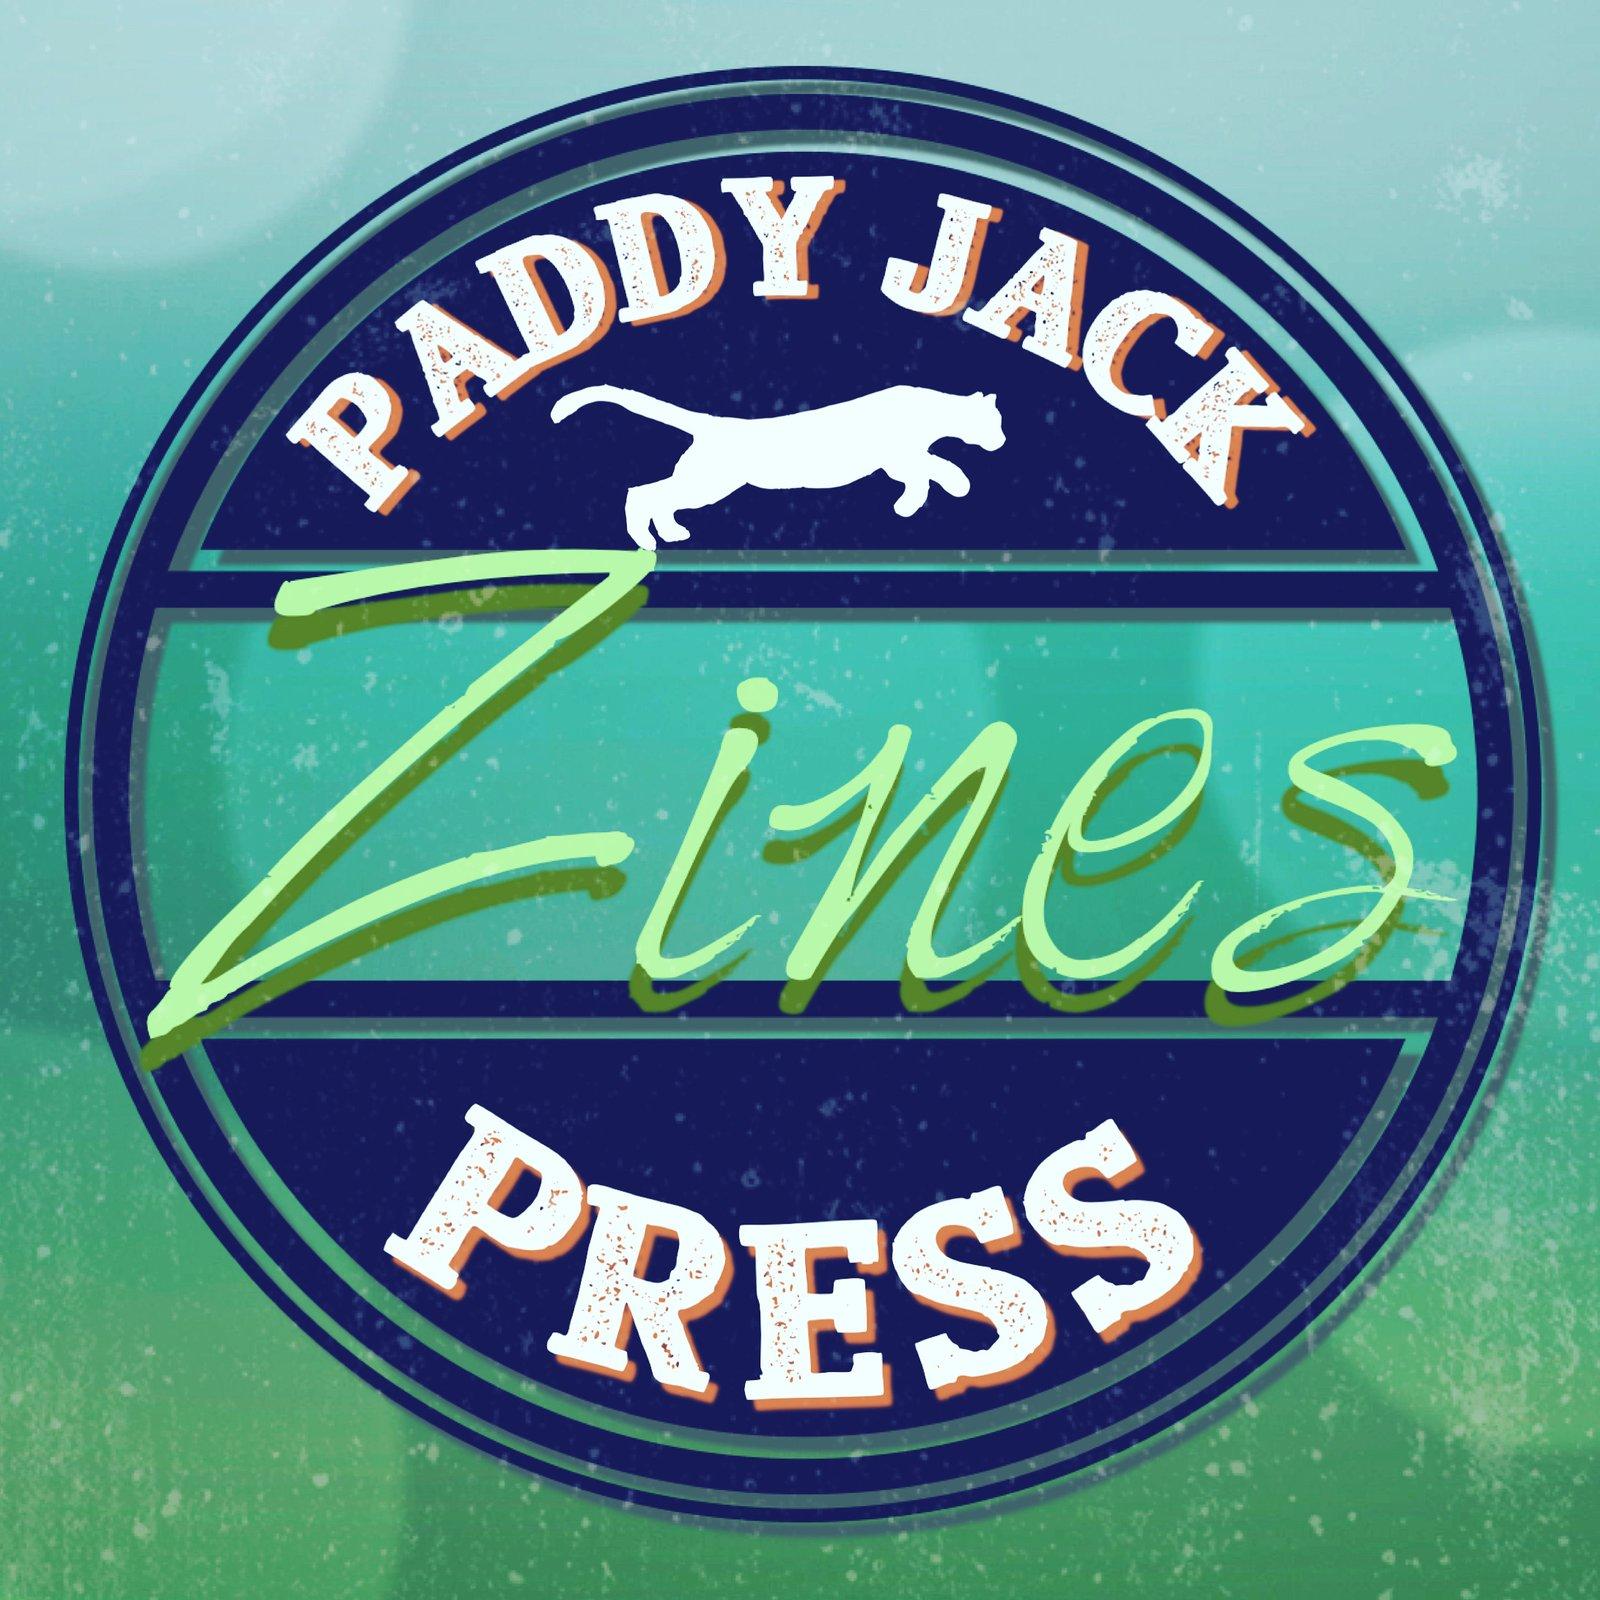 Paddy Jack Press's account image